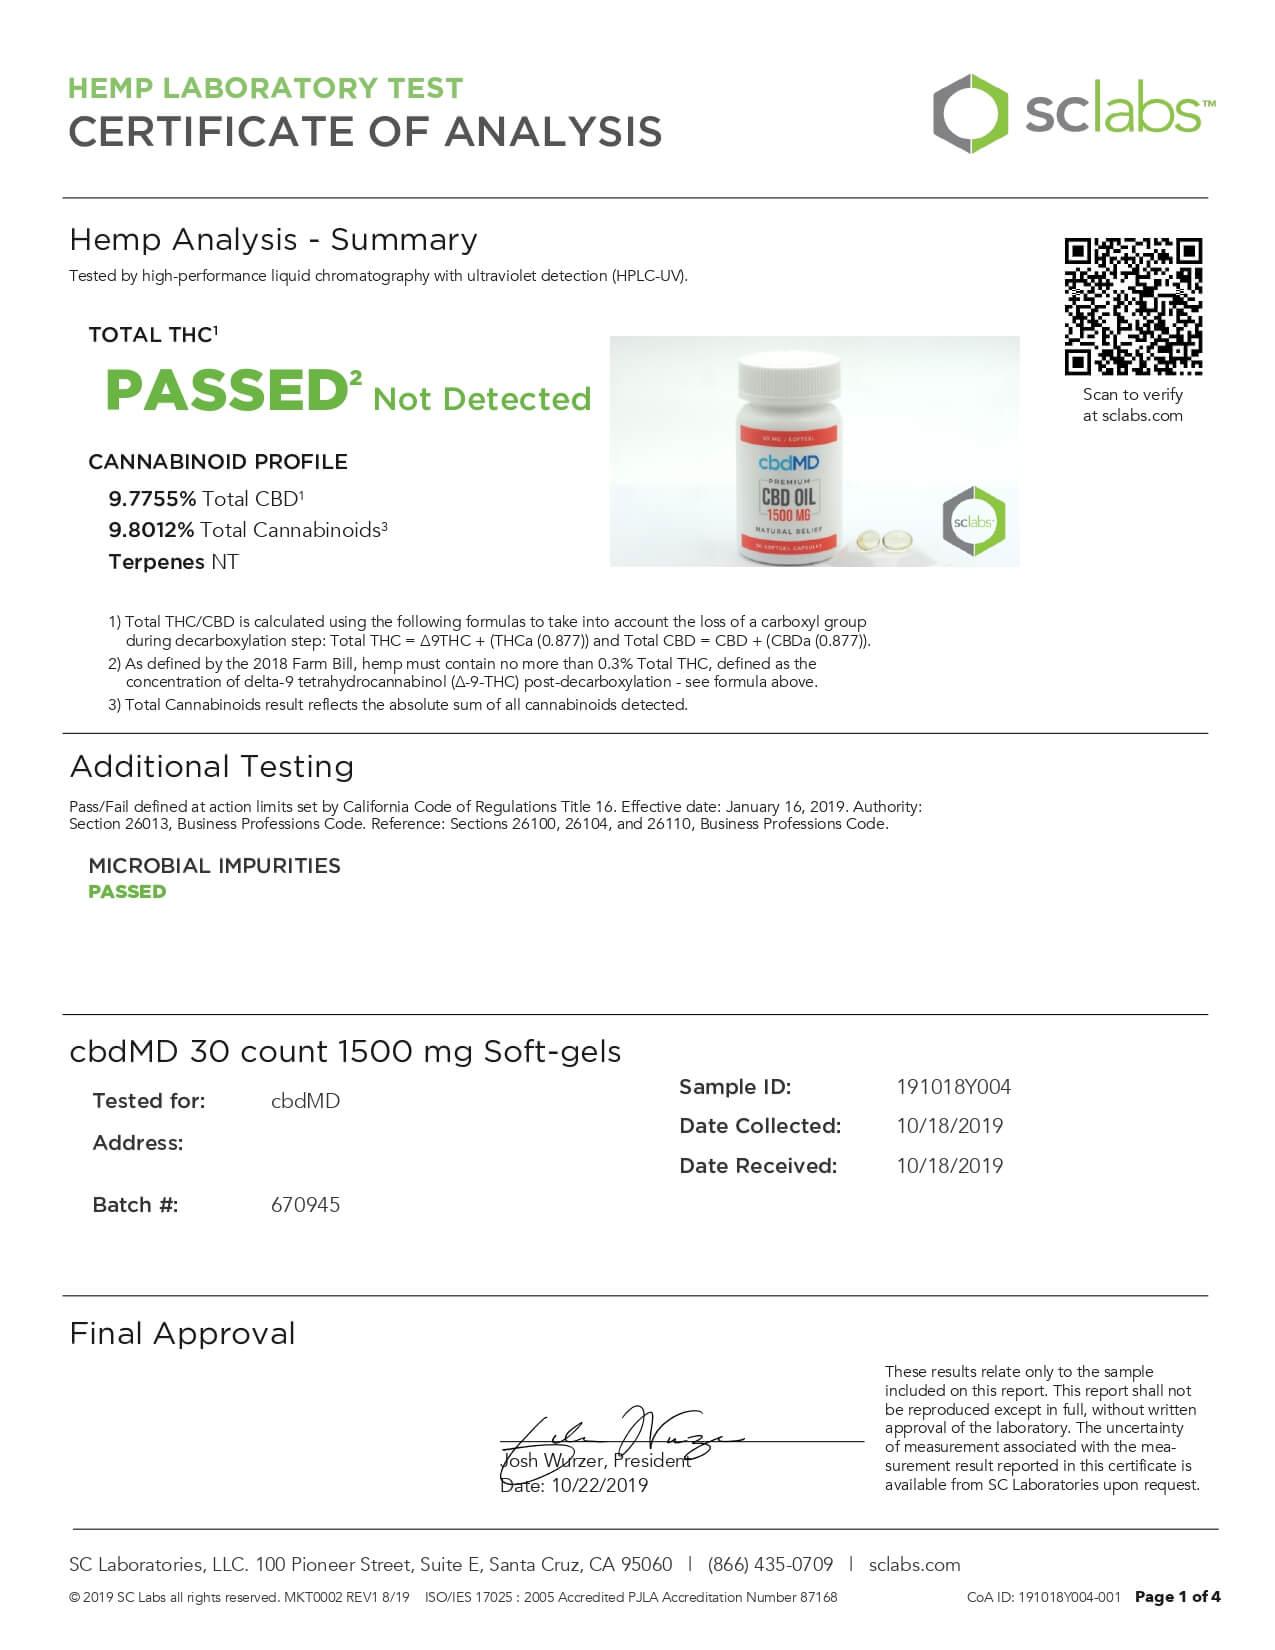 cbdMD CBD Softgels Cbd Oil Softgel Capsules 30ct 1500mg Lab Report